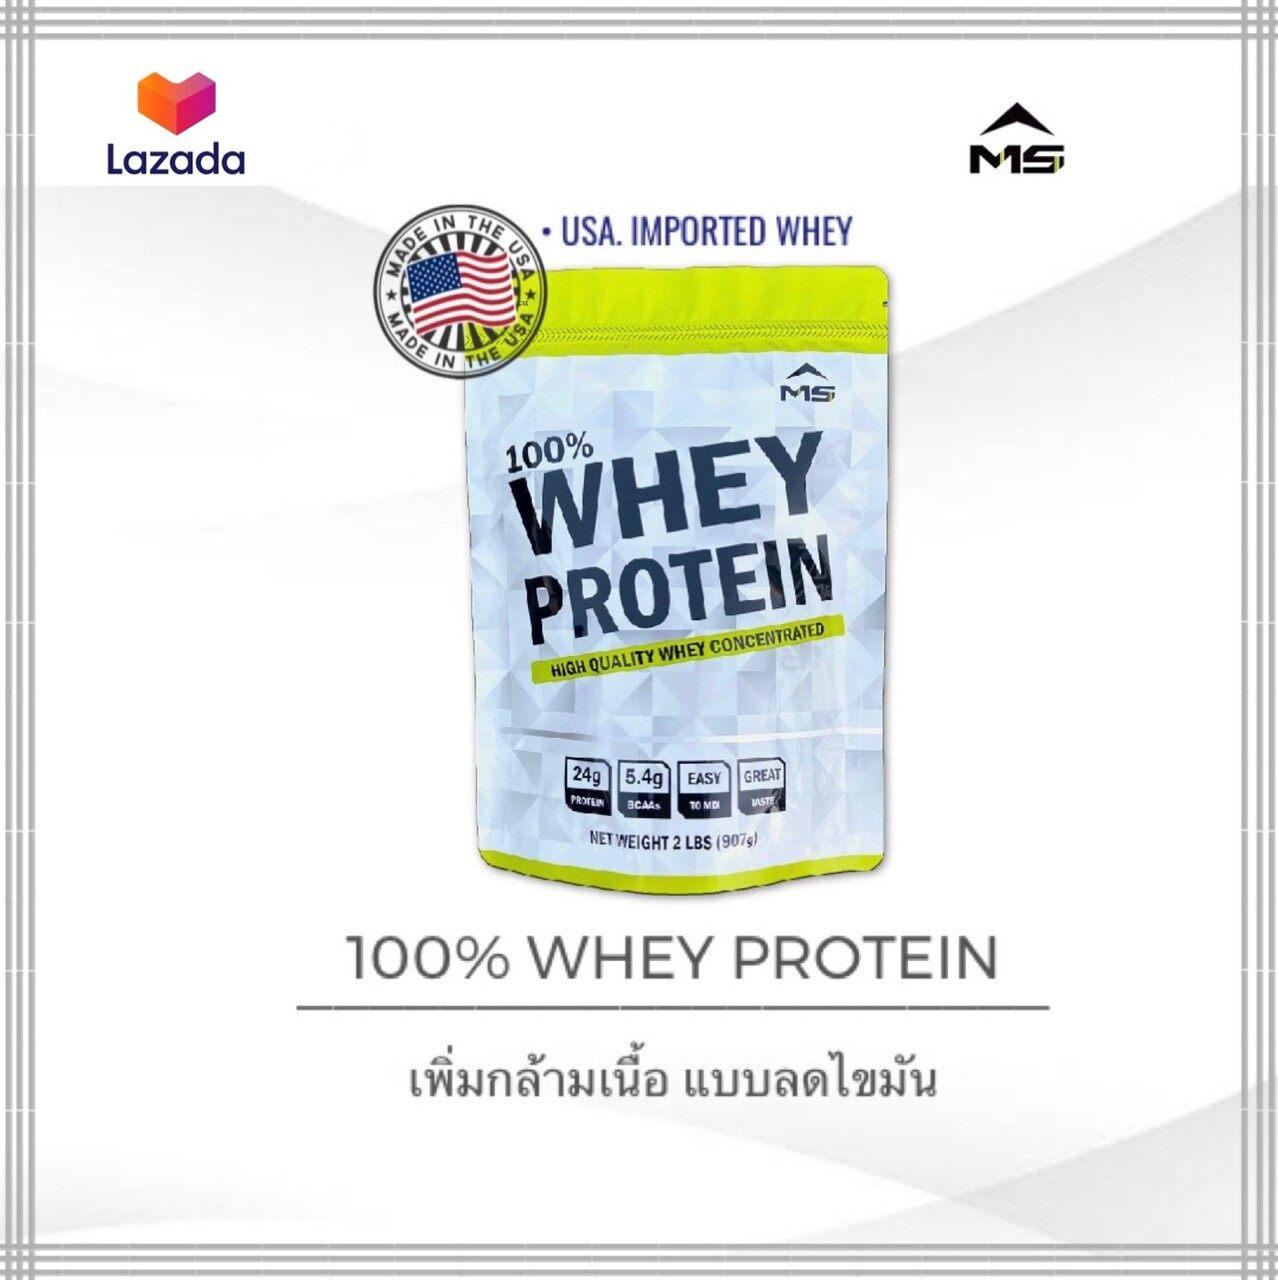 Ms Whey Protein 100% เวย์โปรตีนเพิ่มกล้ามลดไขมัน ขนาด 907 กรัม.